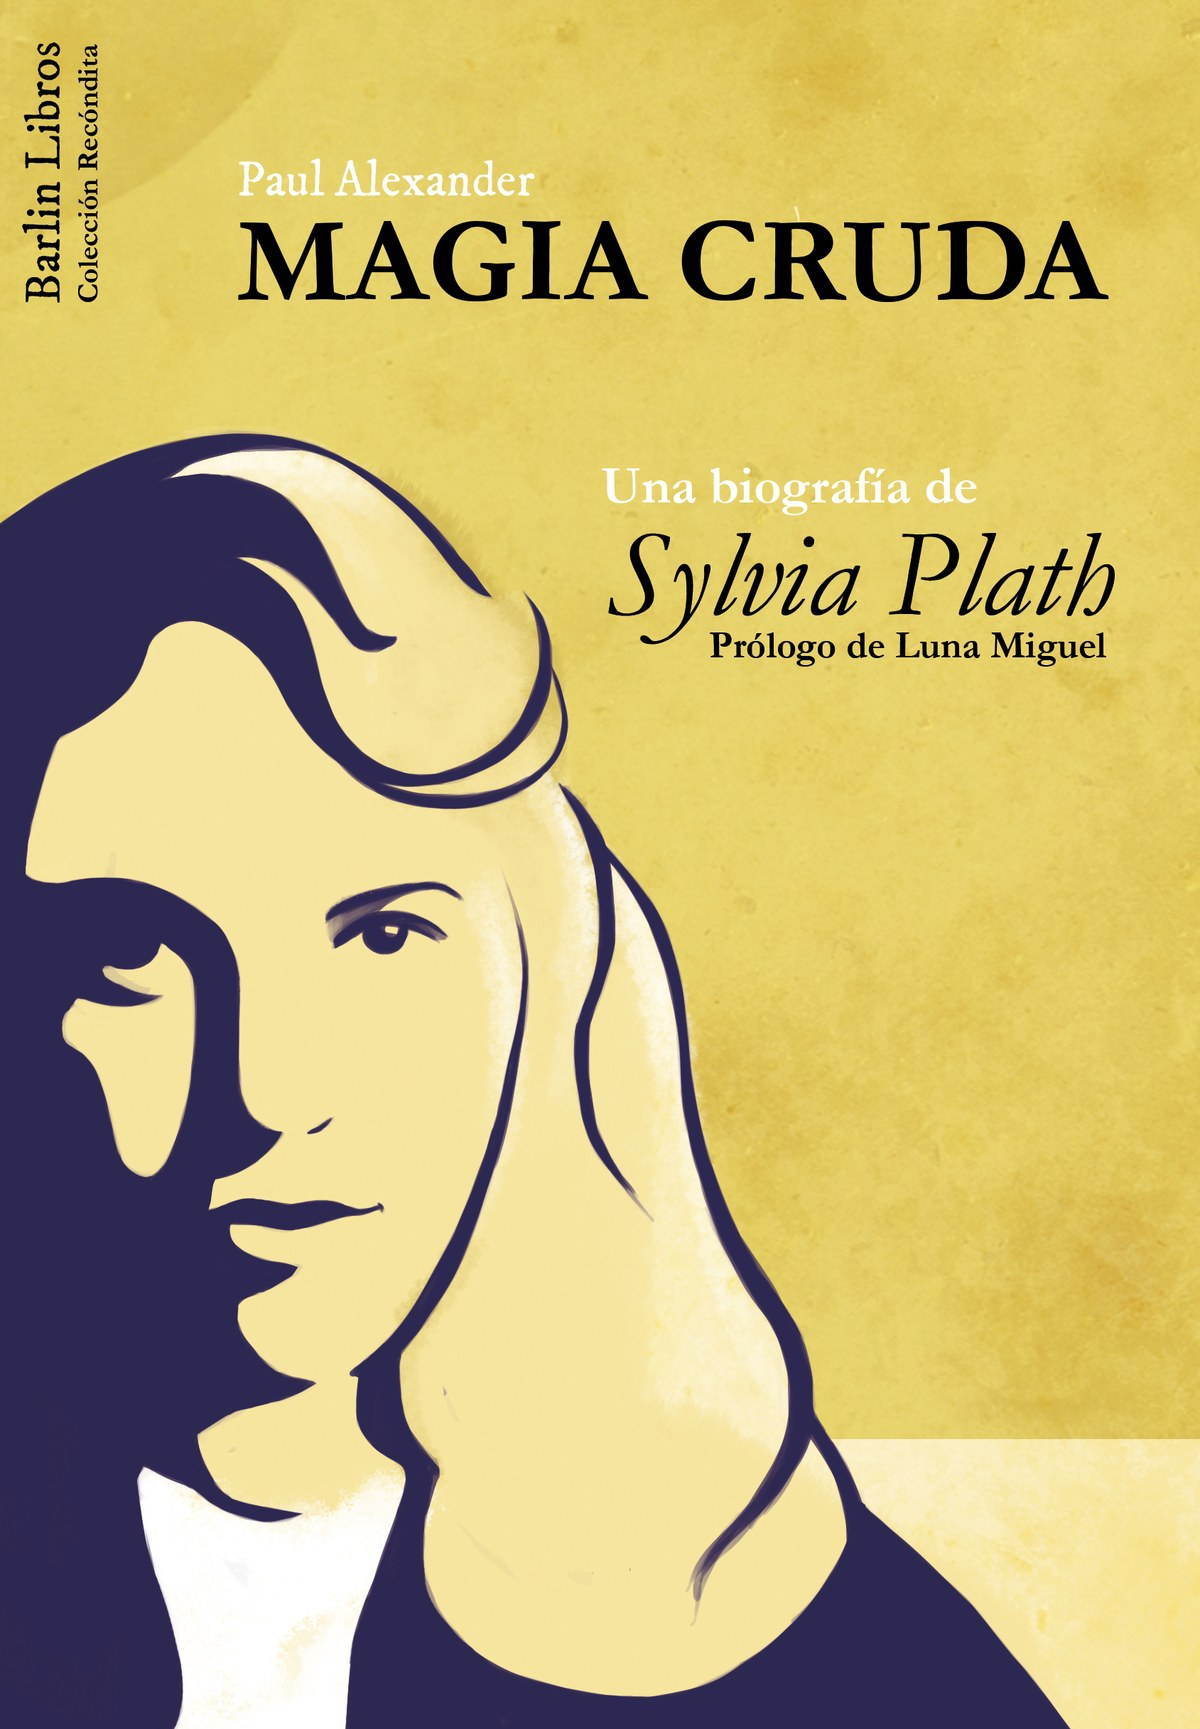 Magia Cruda